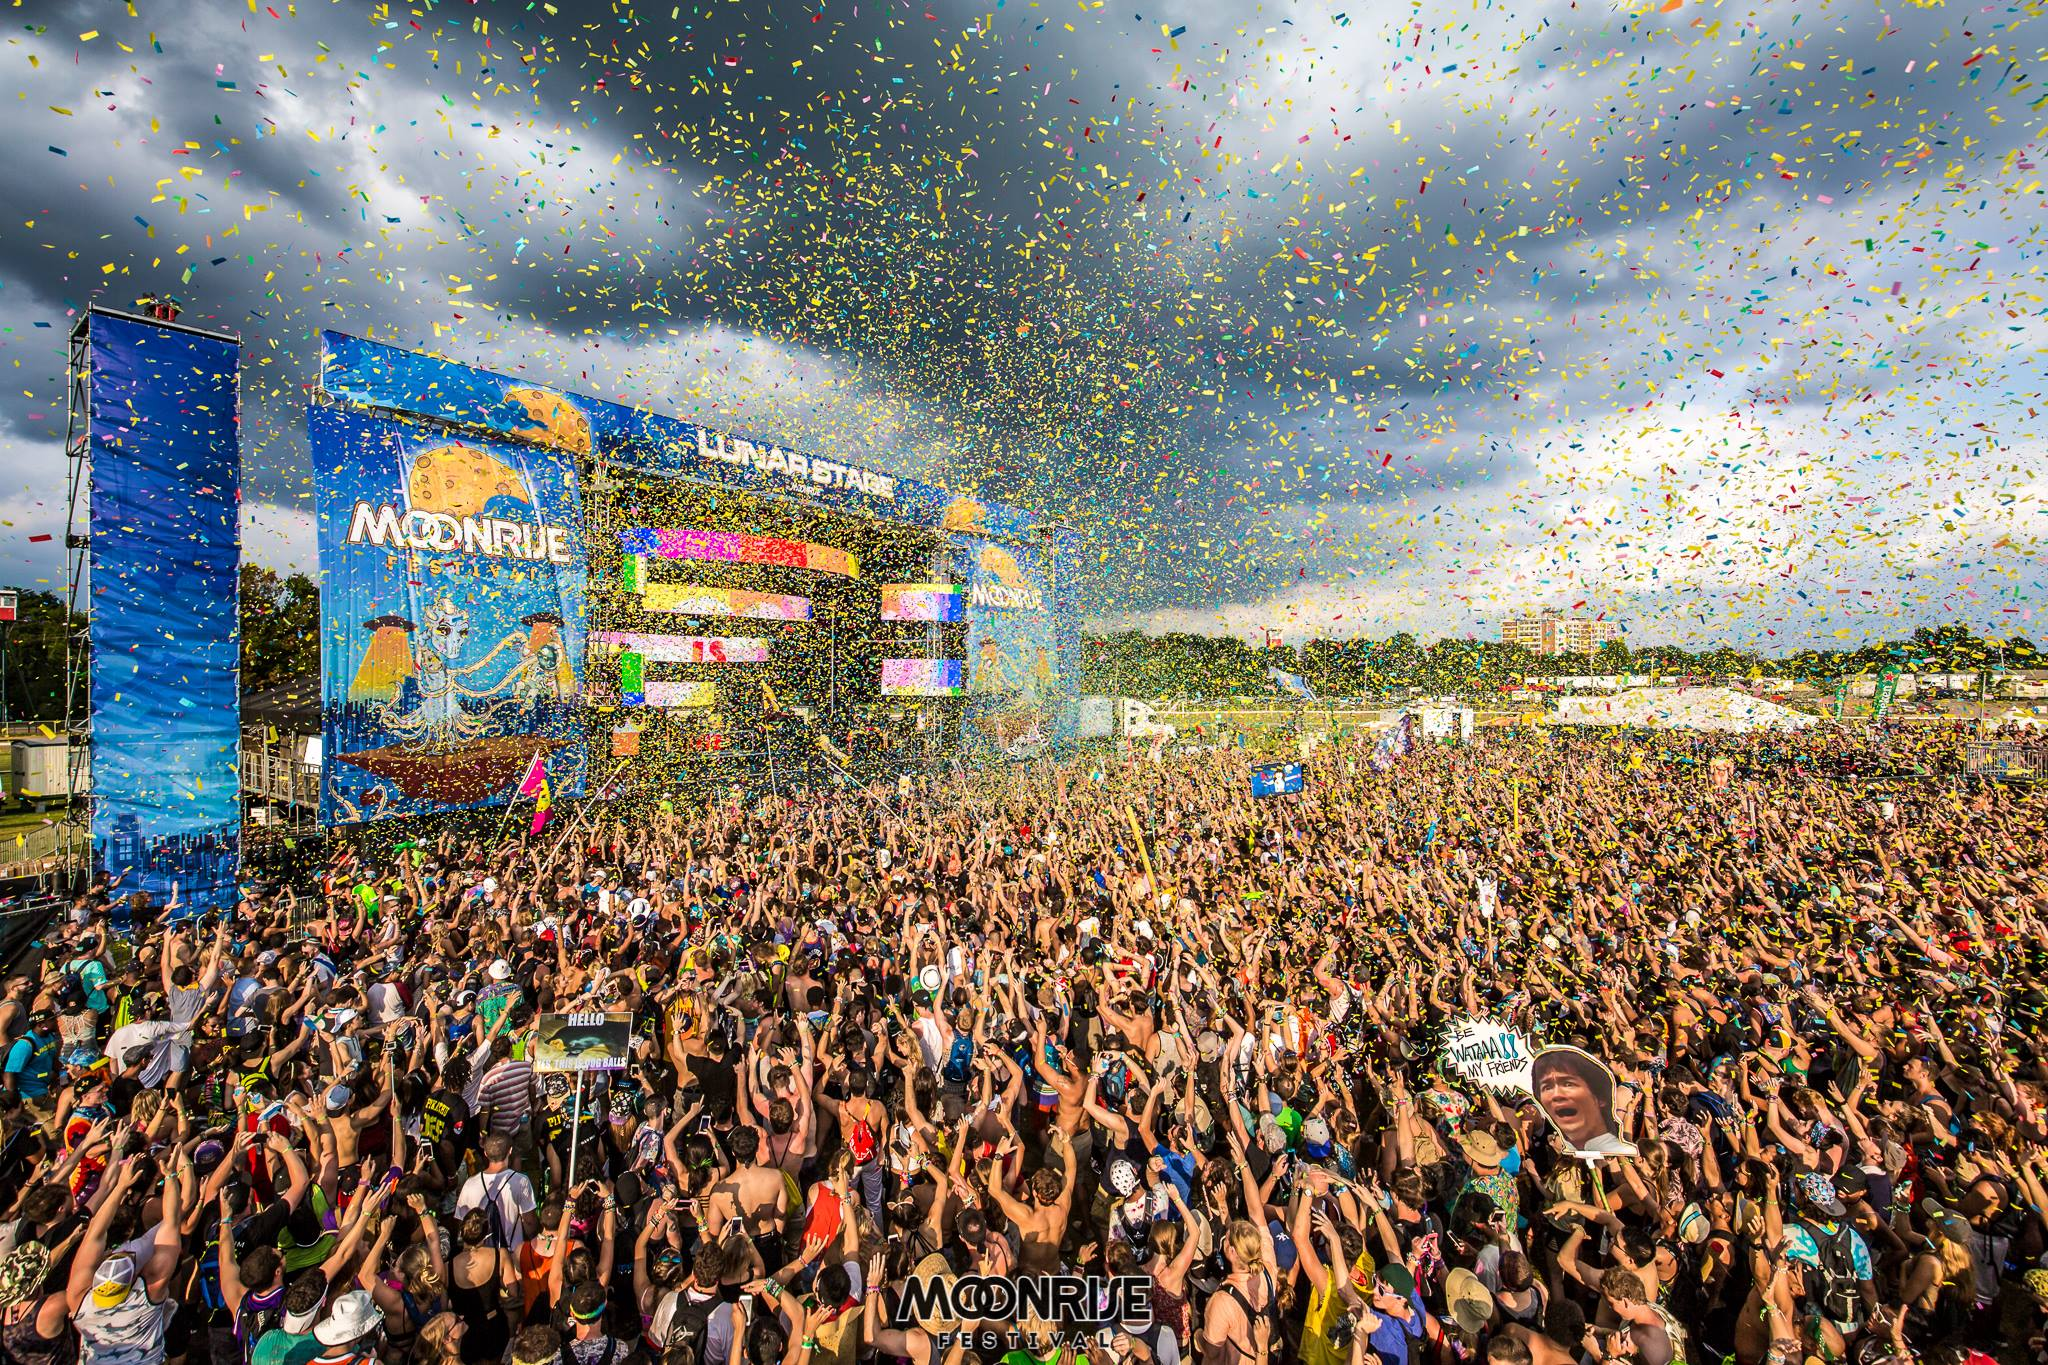 Moonrise Festival Crowd Confetti.jpg